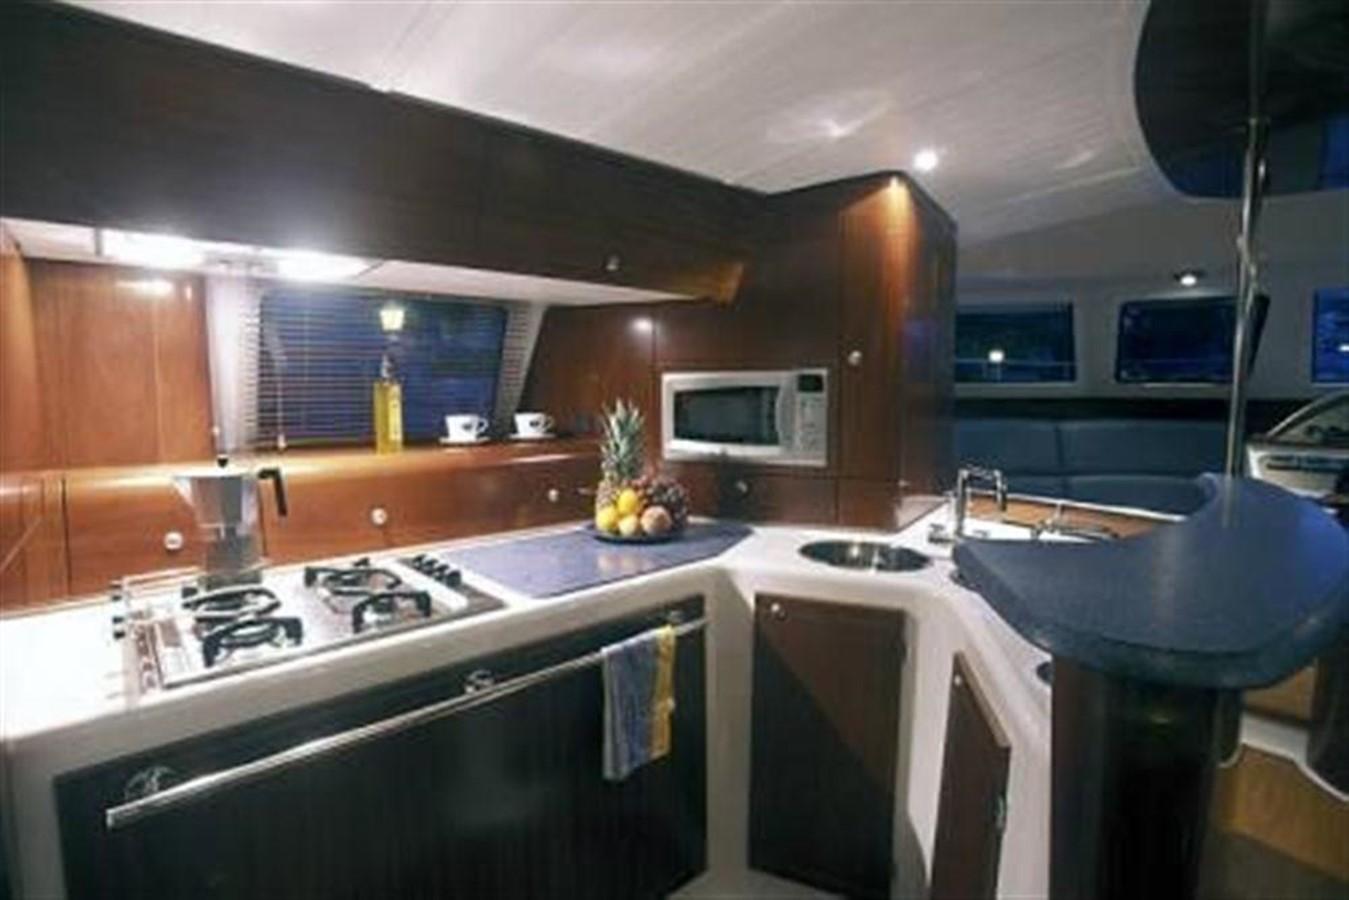 Chefs Delight 2007 FOUNTAINE PAJOT Cumberland Catamaran 87145